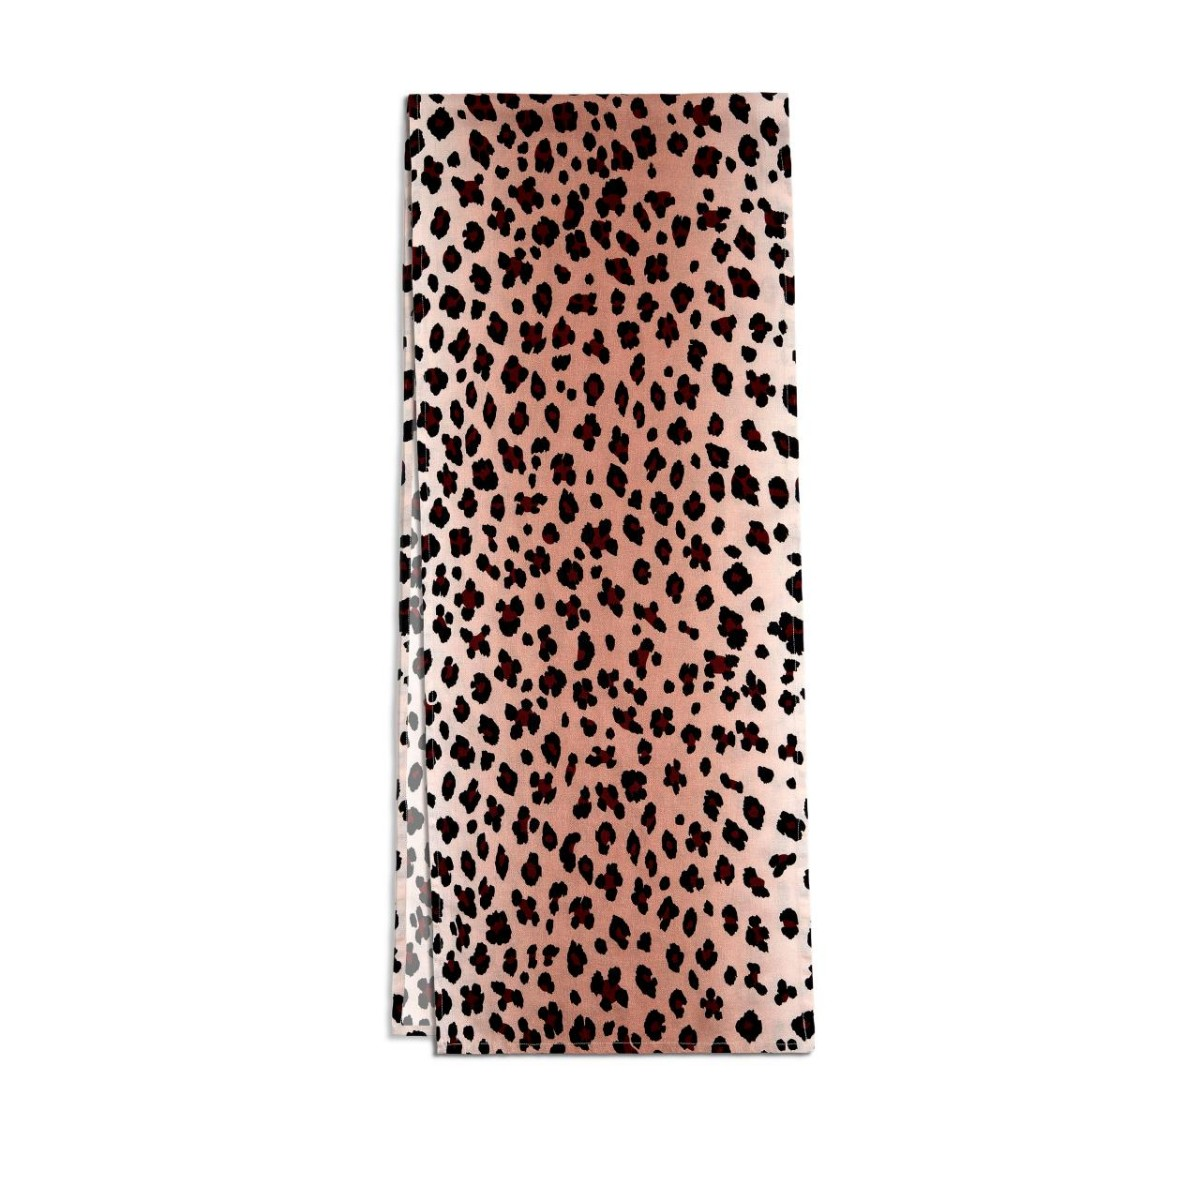 L'Objet I Linen Sateen Runner Leopard - Pink